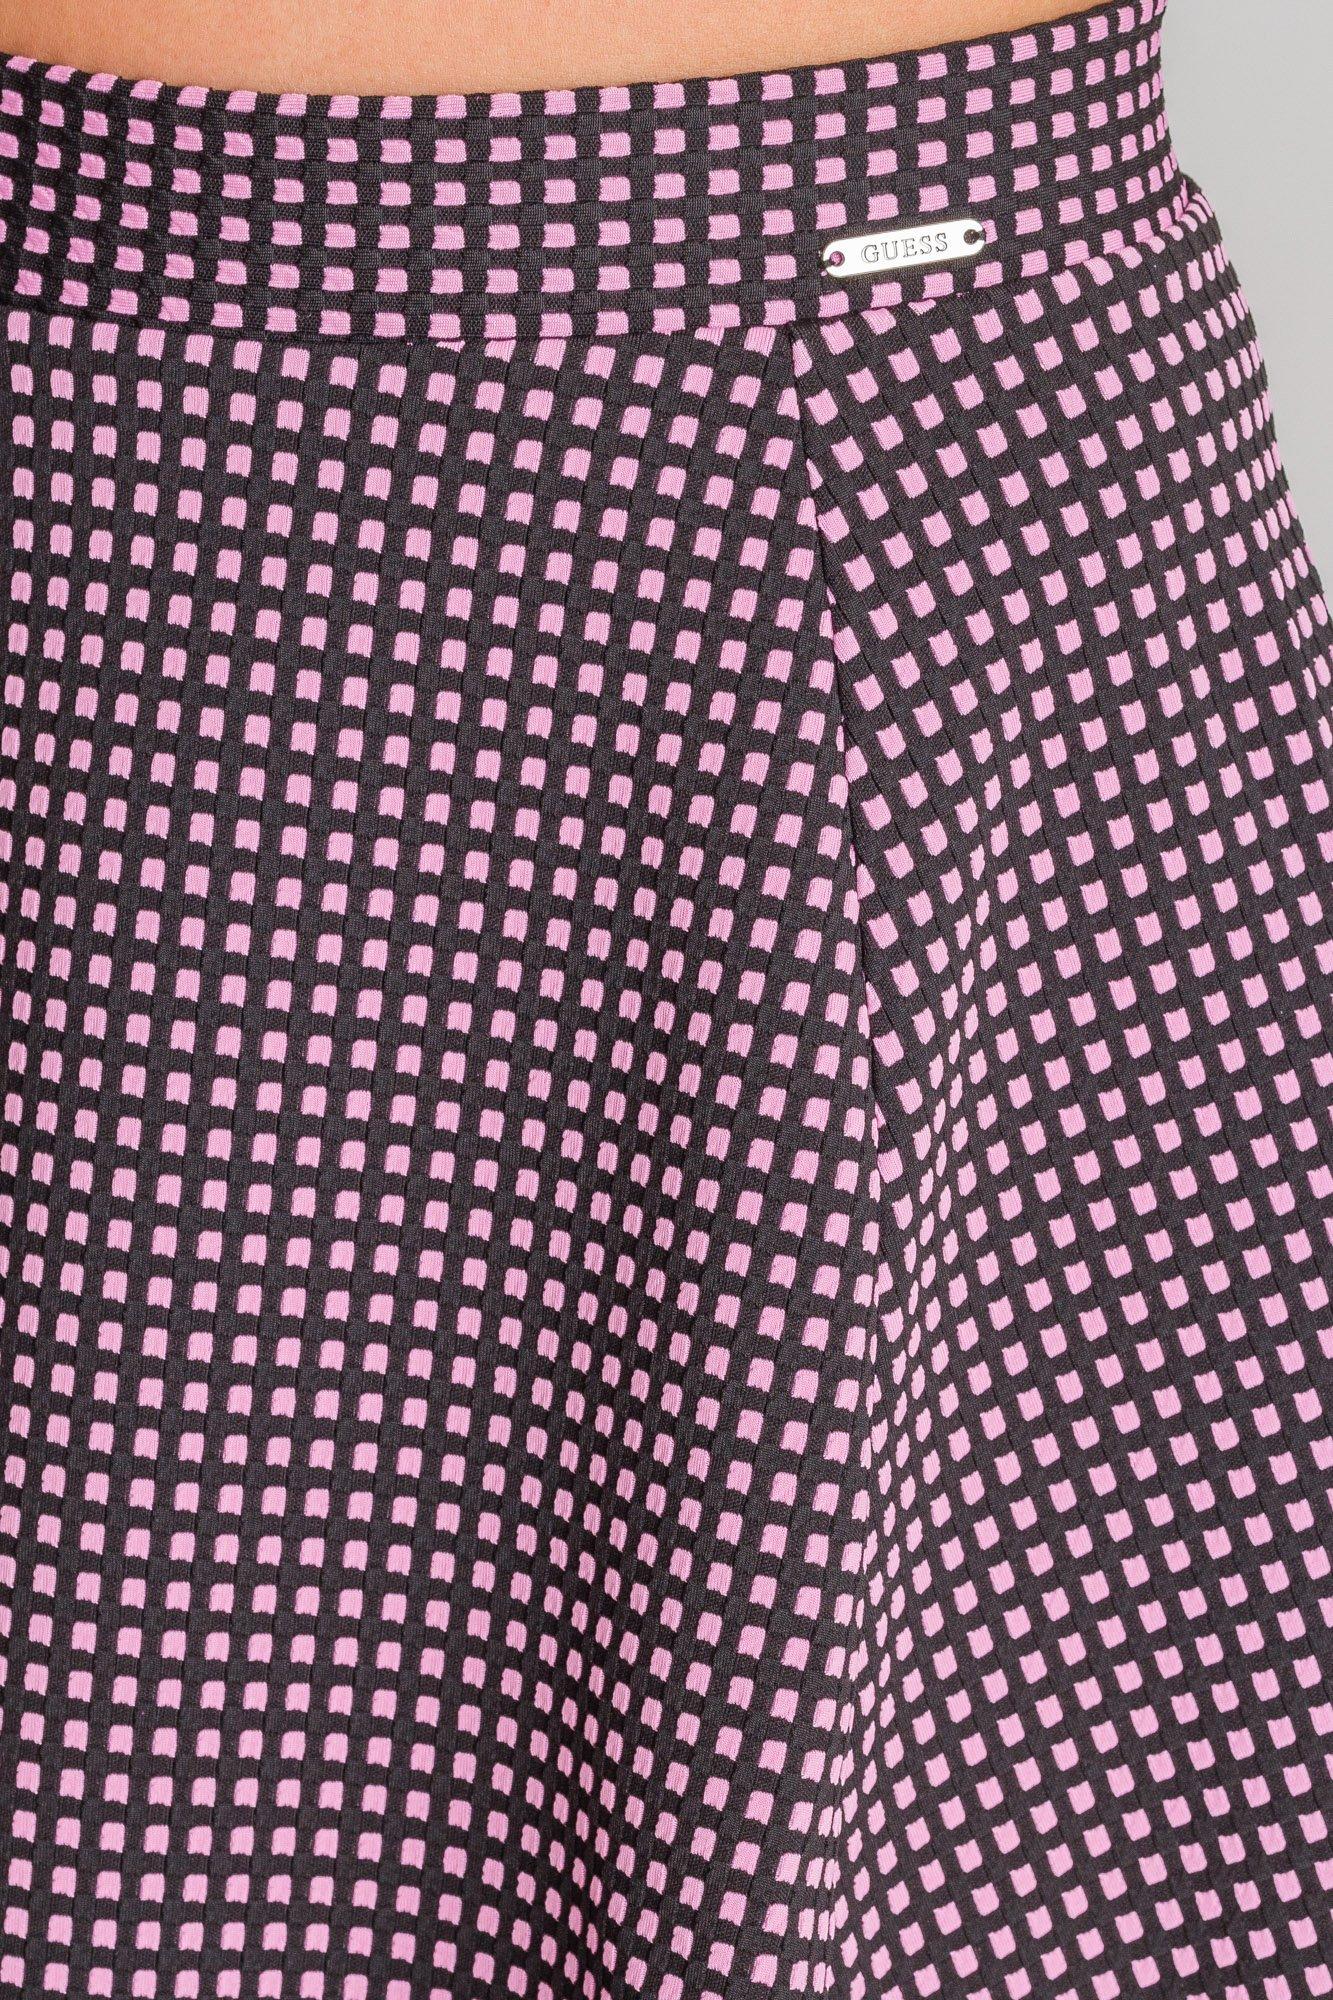 c14704d0 Różowa spódnica Guess Romina w kratę